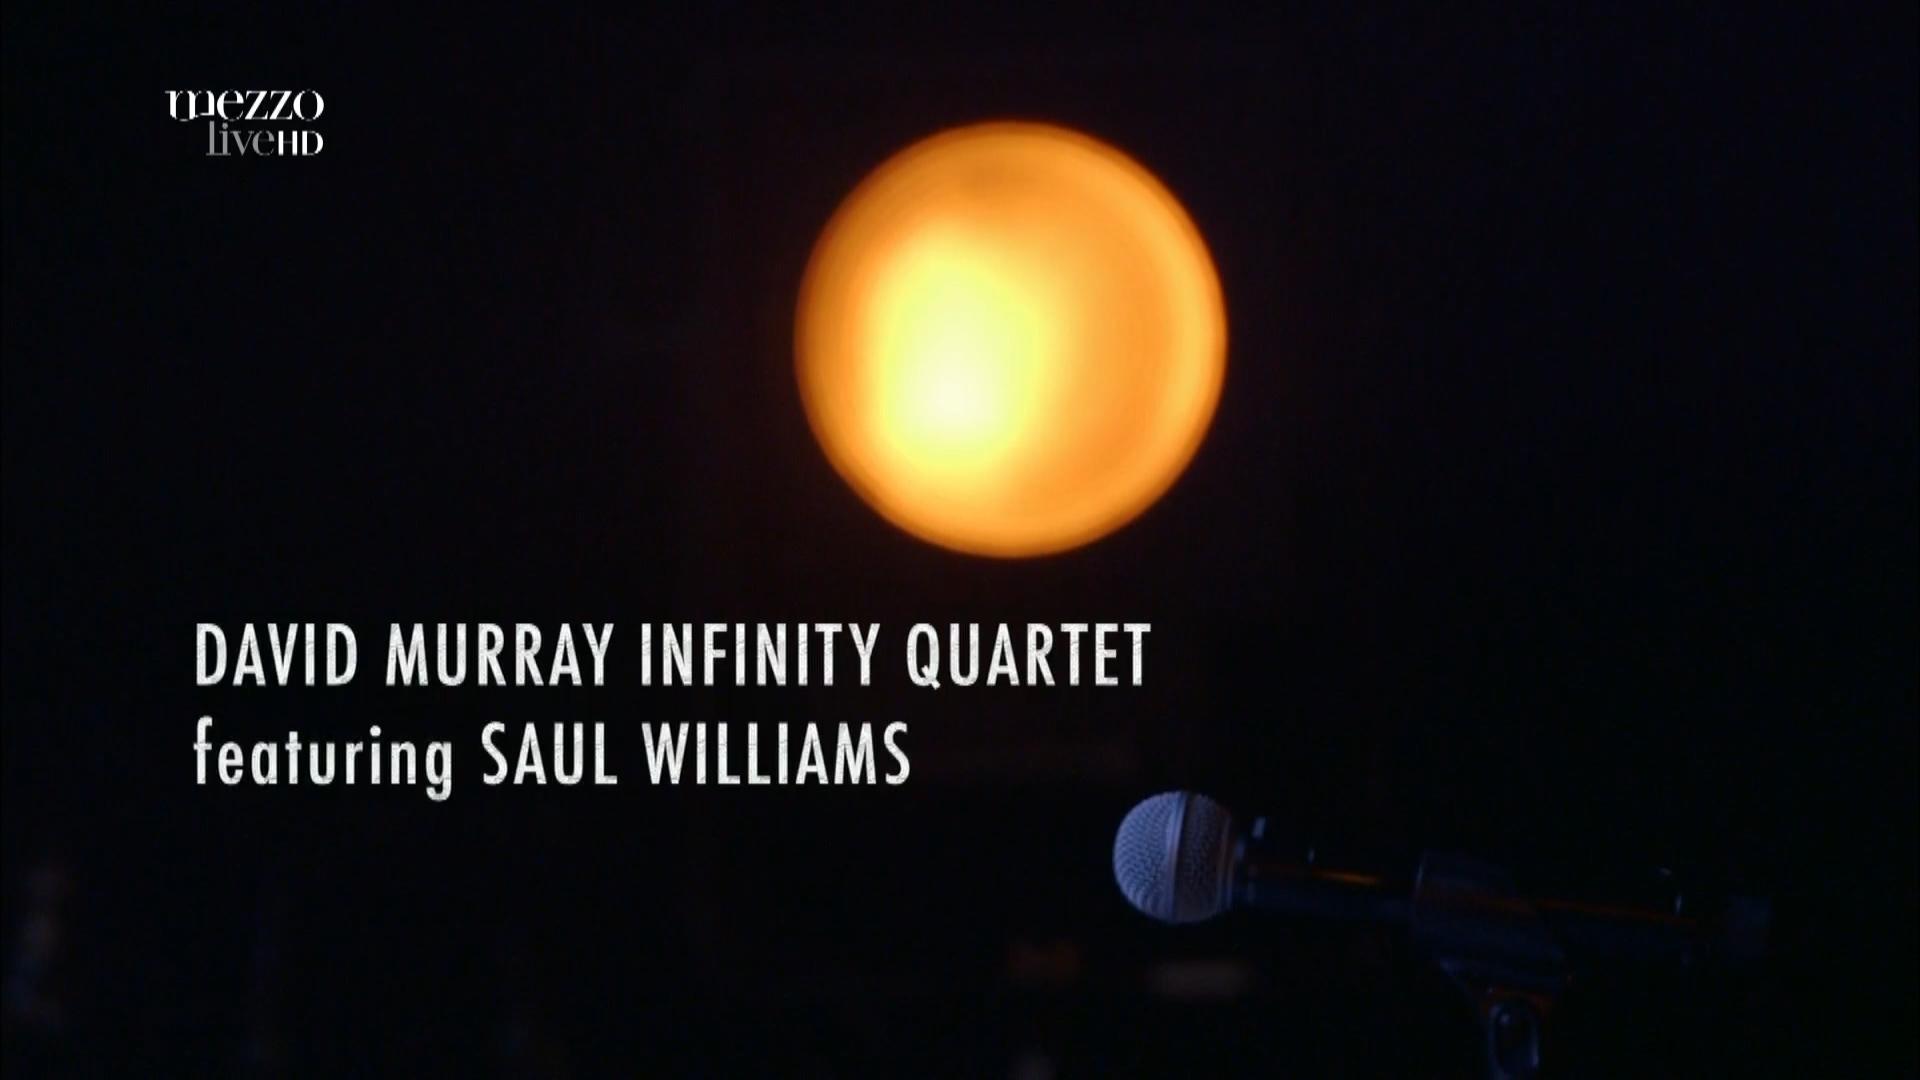 2015 David Murray Infinity Quartet feat. Saul Williams - Disruption at Banlieues Bleues Jazz Fest [HDTV 1080i] 0